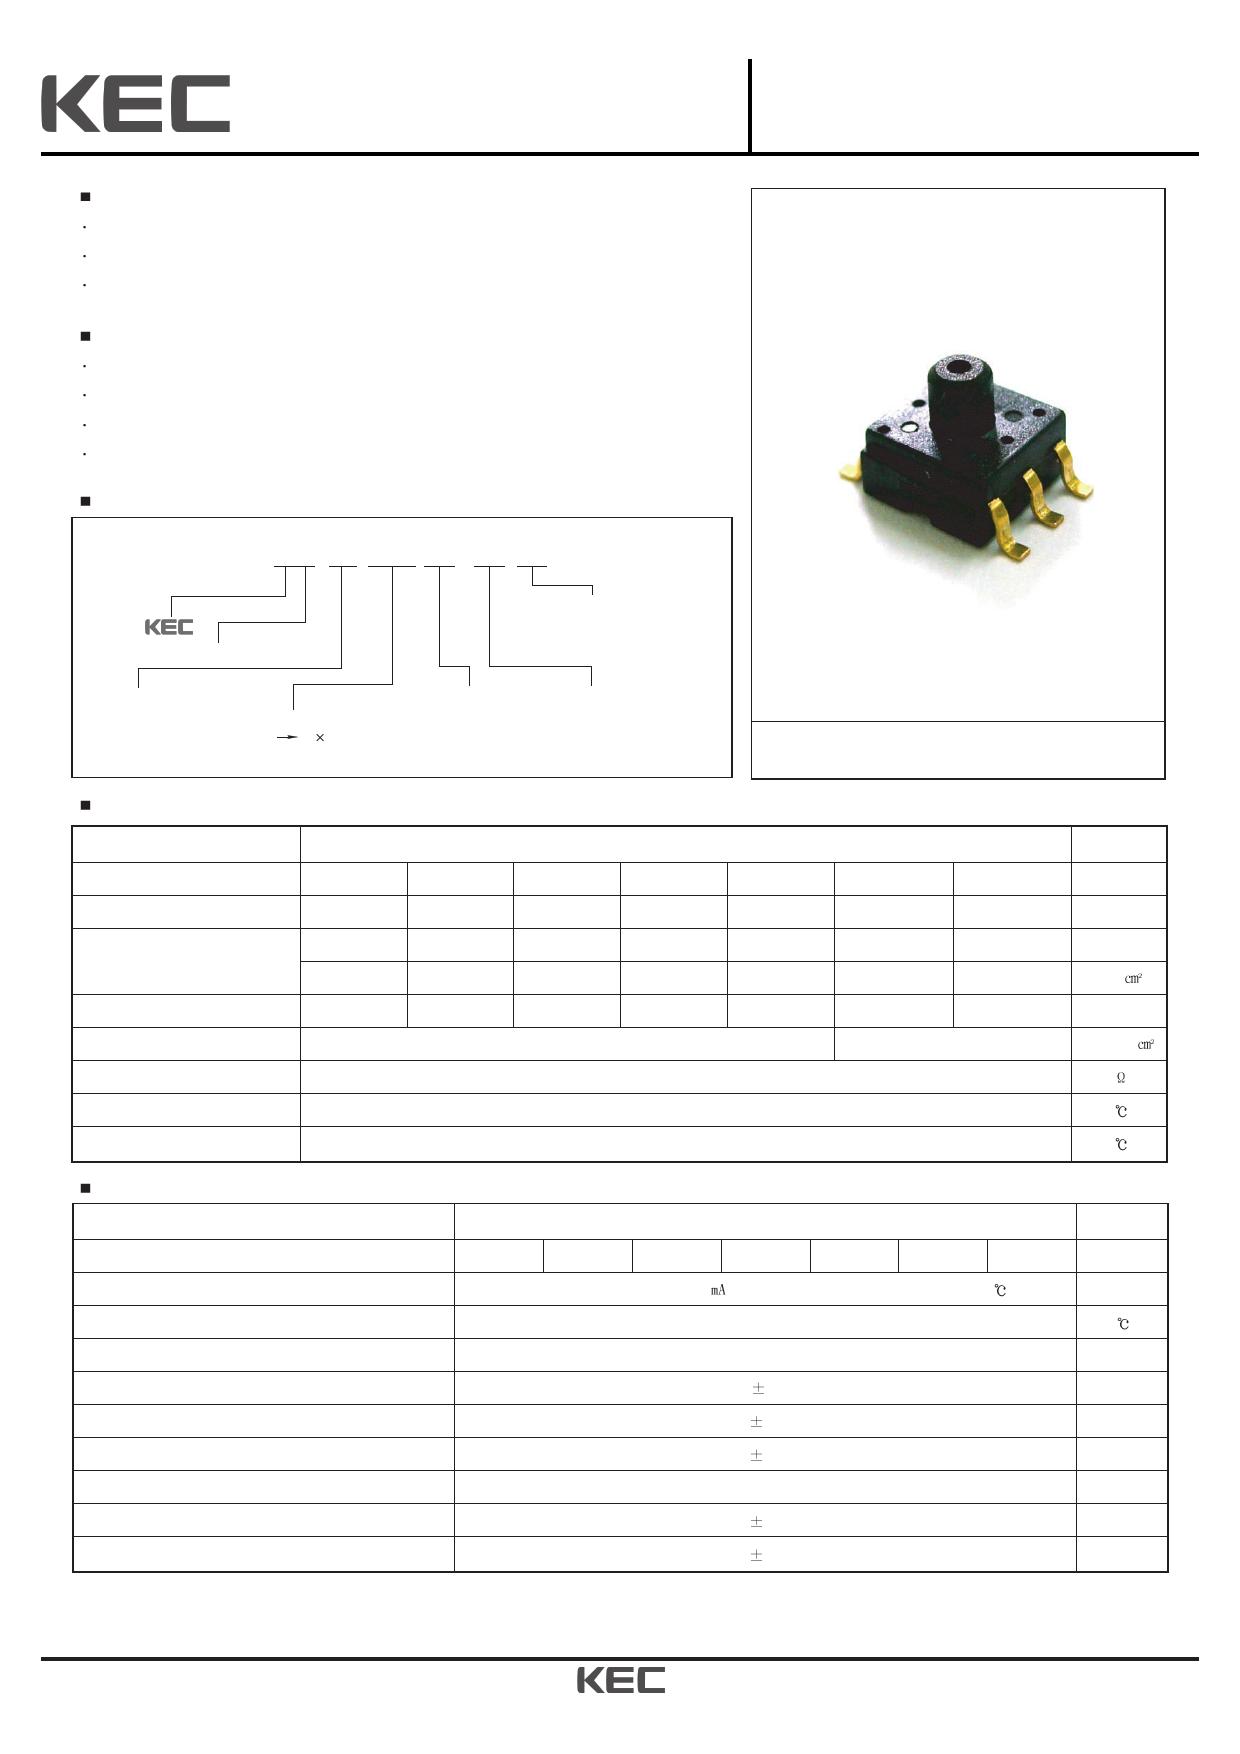 KPF801G03 데이터시트 및 KPF801G03 PDF